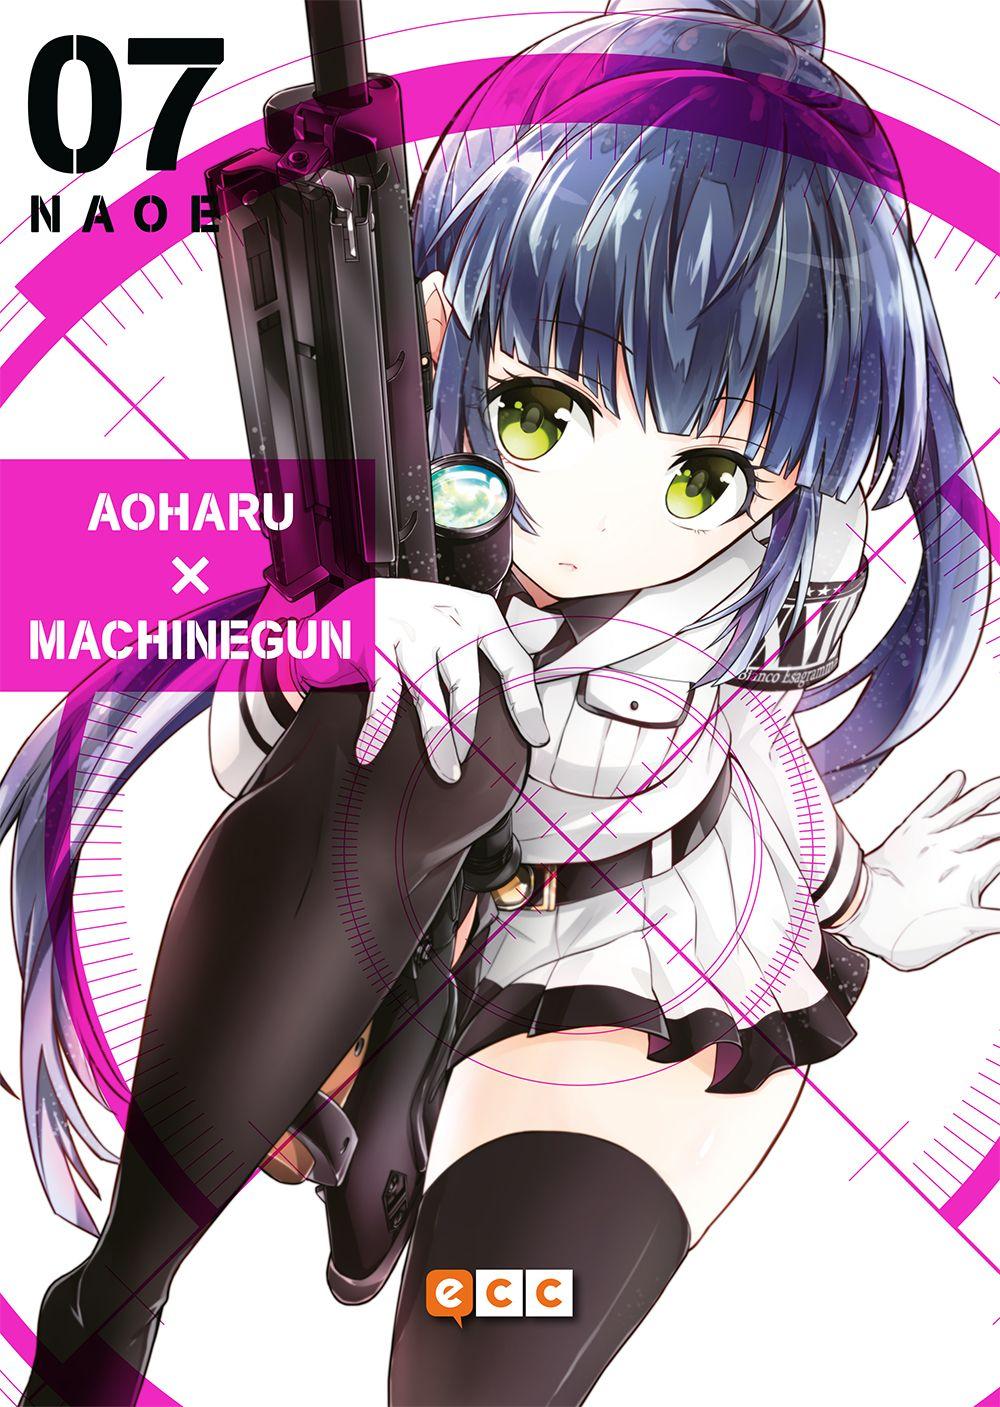 Aoharu x Machinegun 7